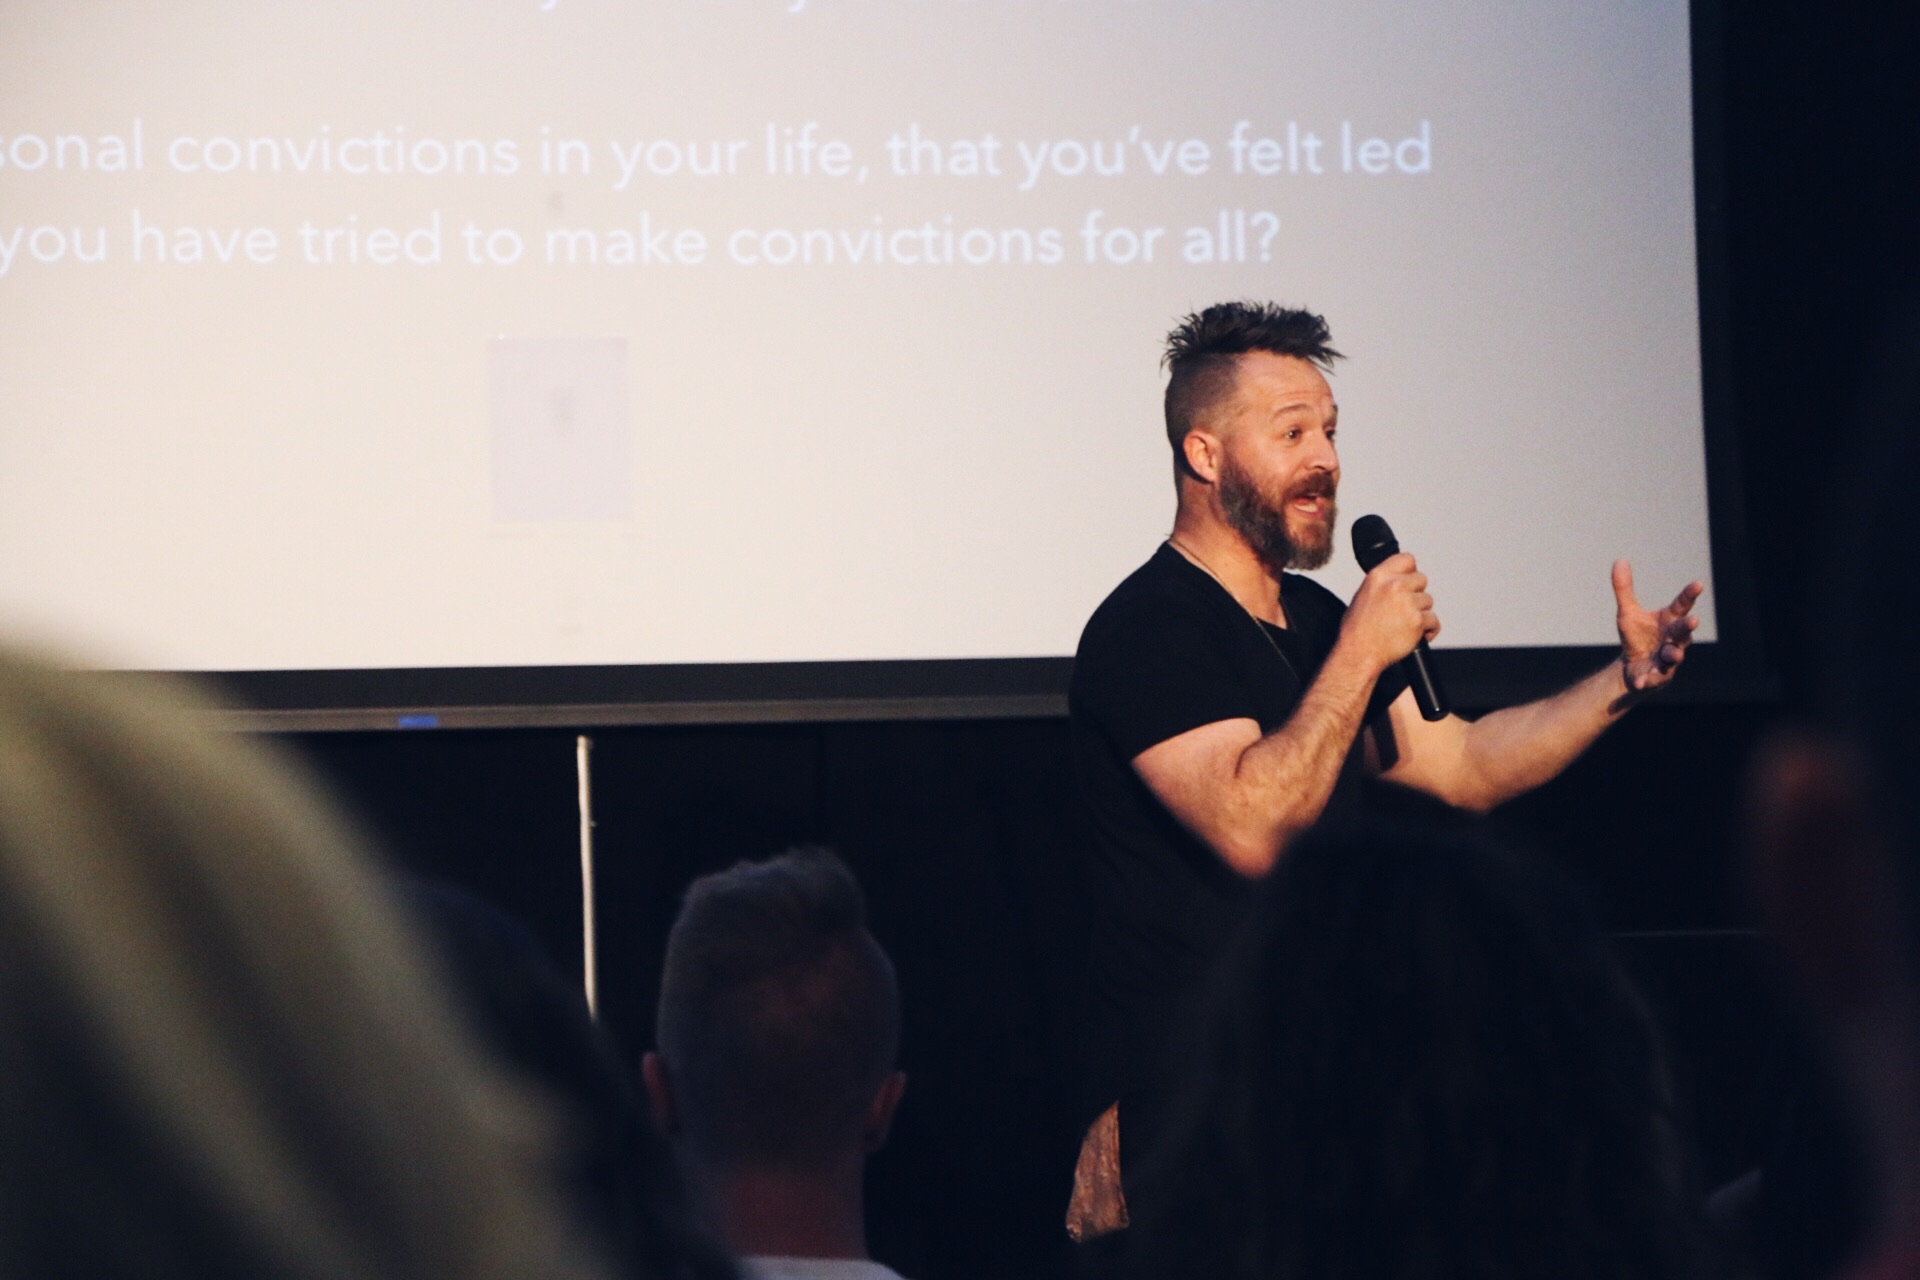 October 21, 2018 - Listen to JR Baker's last Sunday sermon!